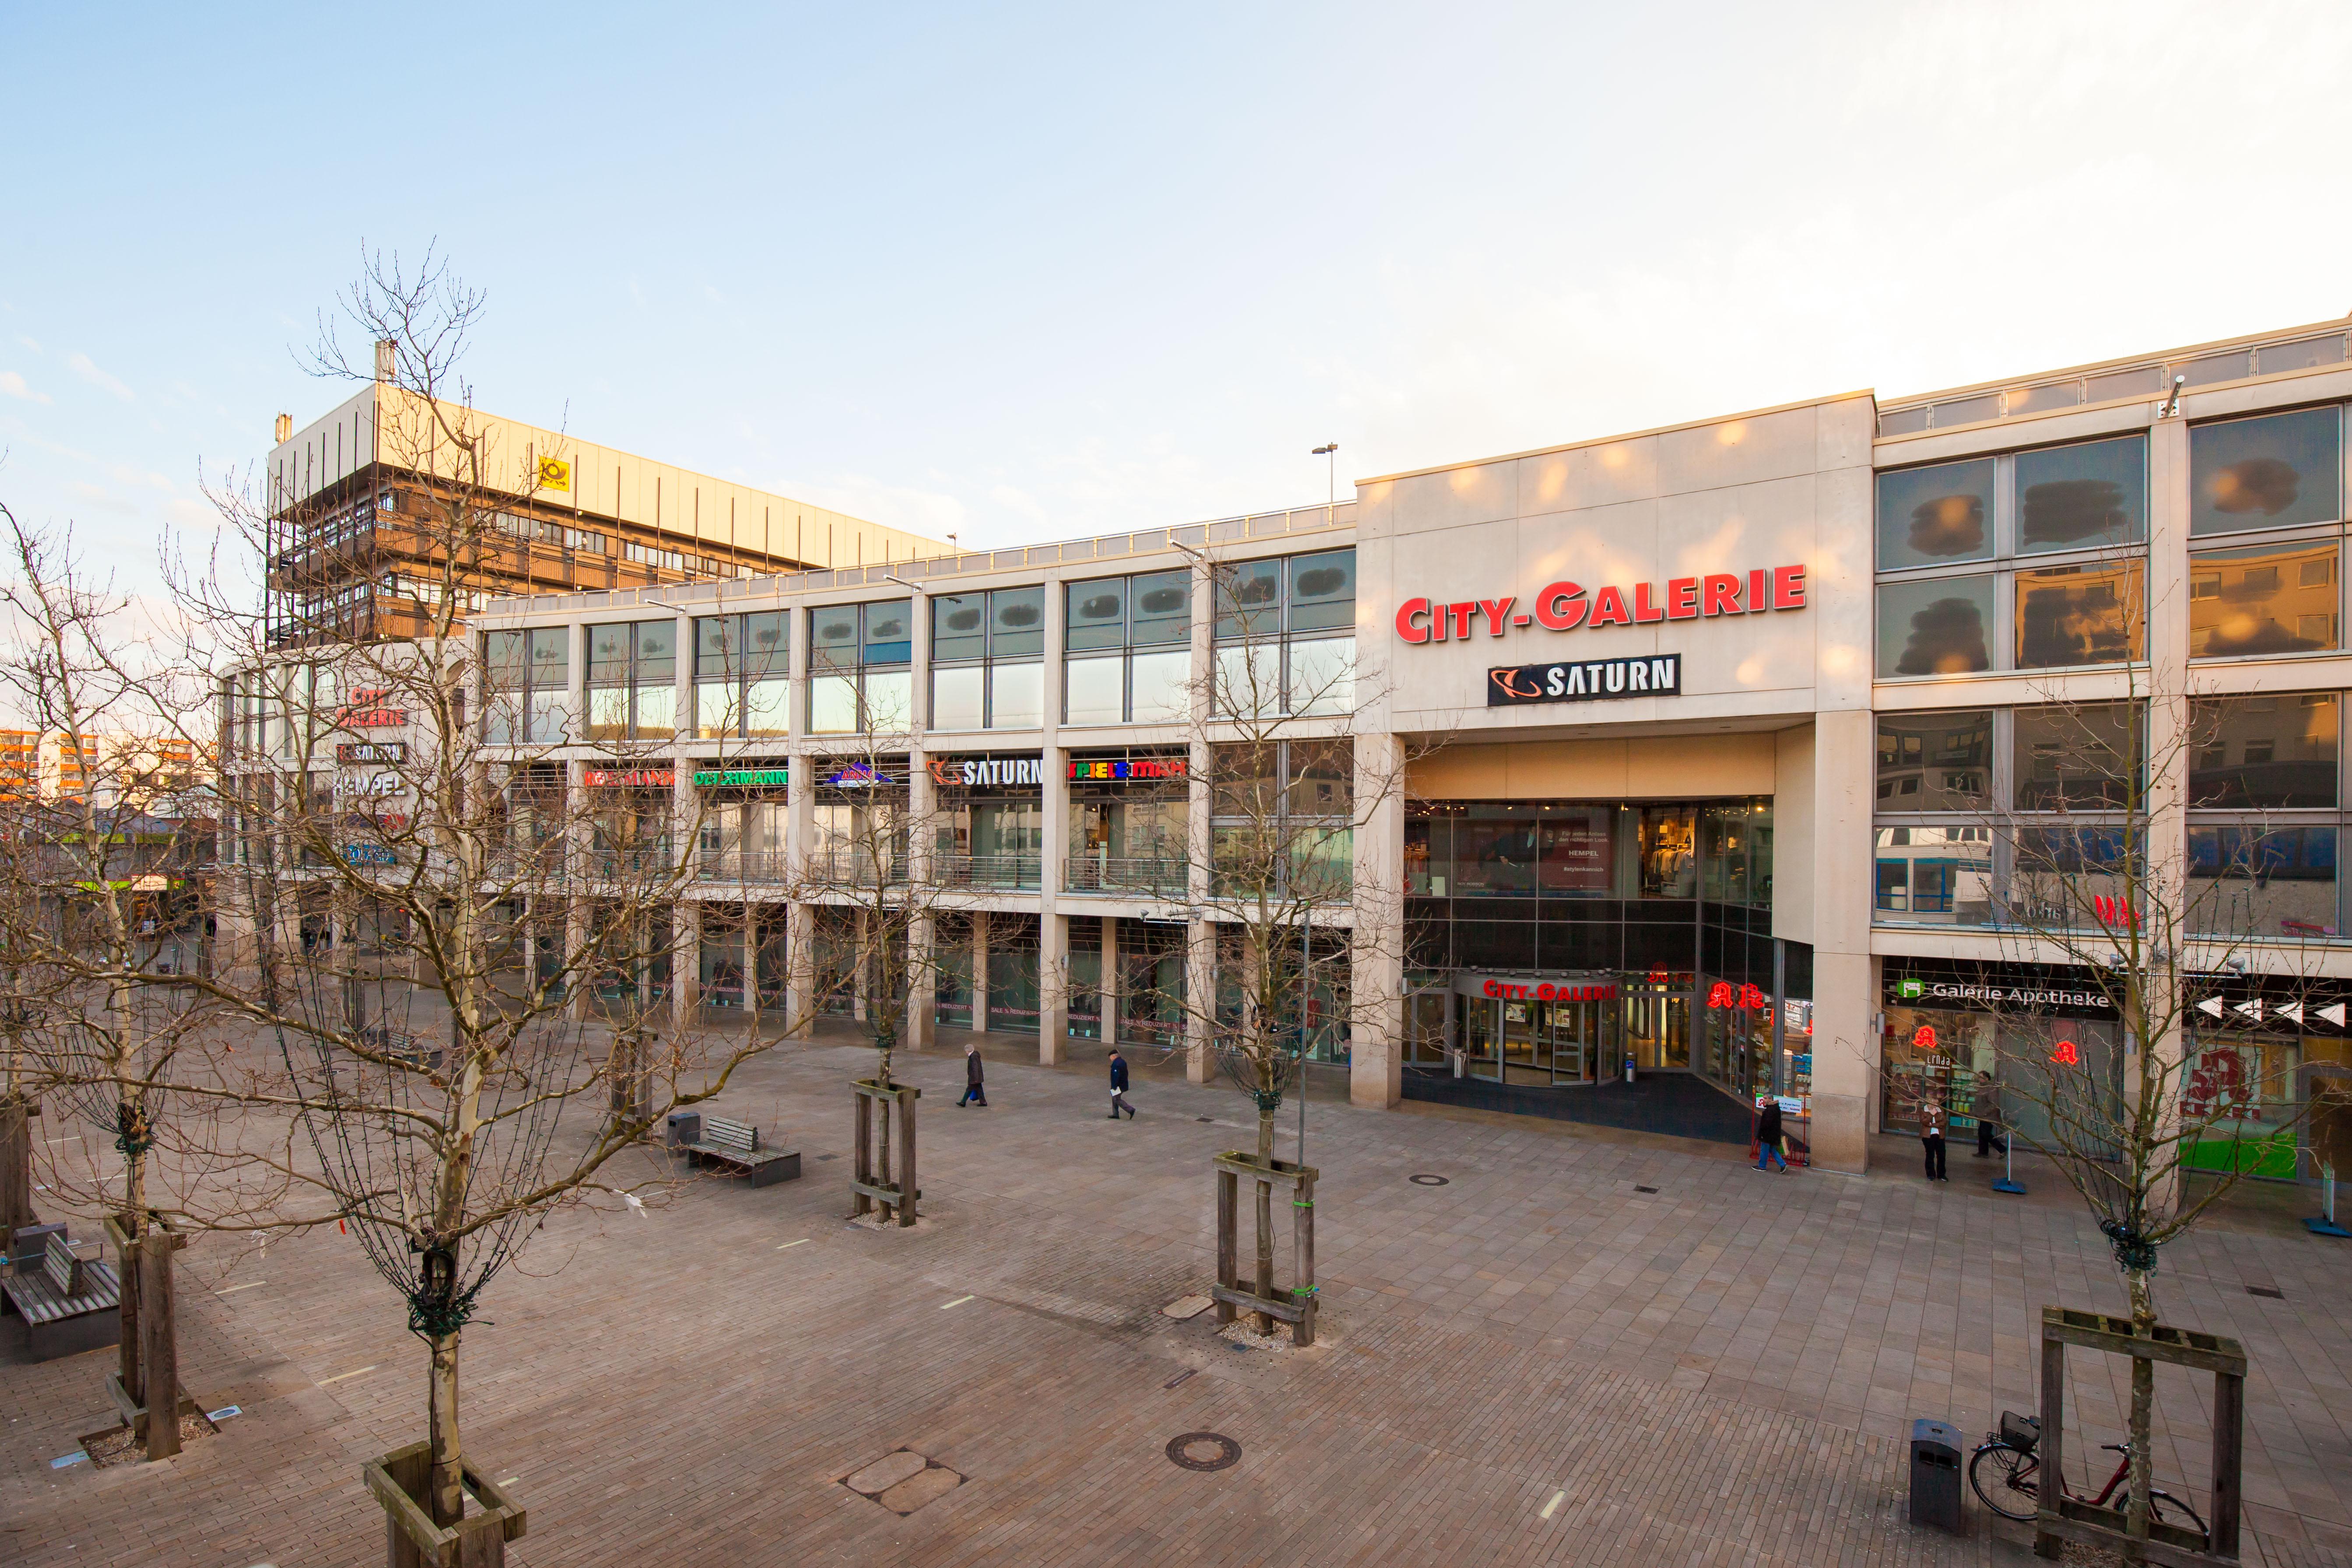 City Galerie 38440 City Galerie Wolfsburg Wolfsburg City In 38440 In Ku3l1JTFc